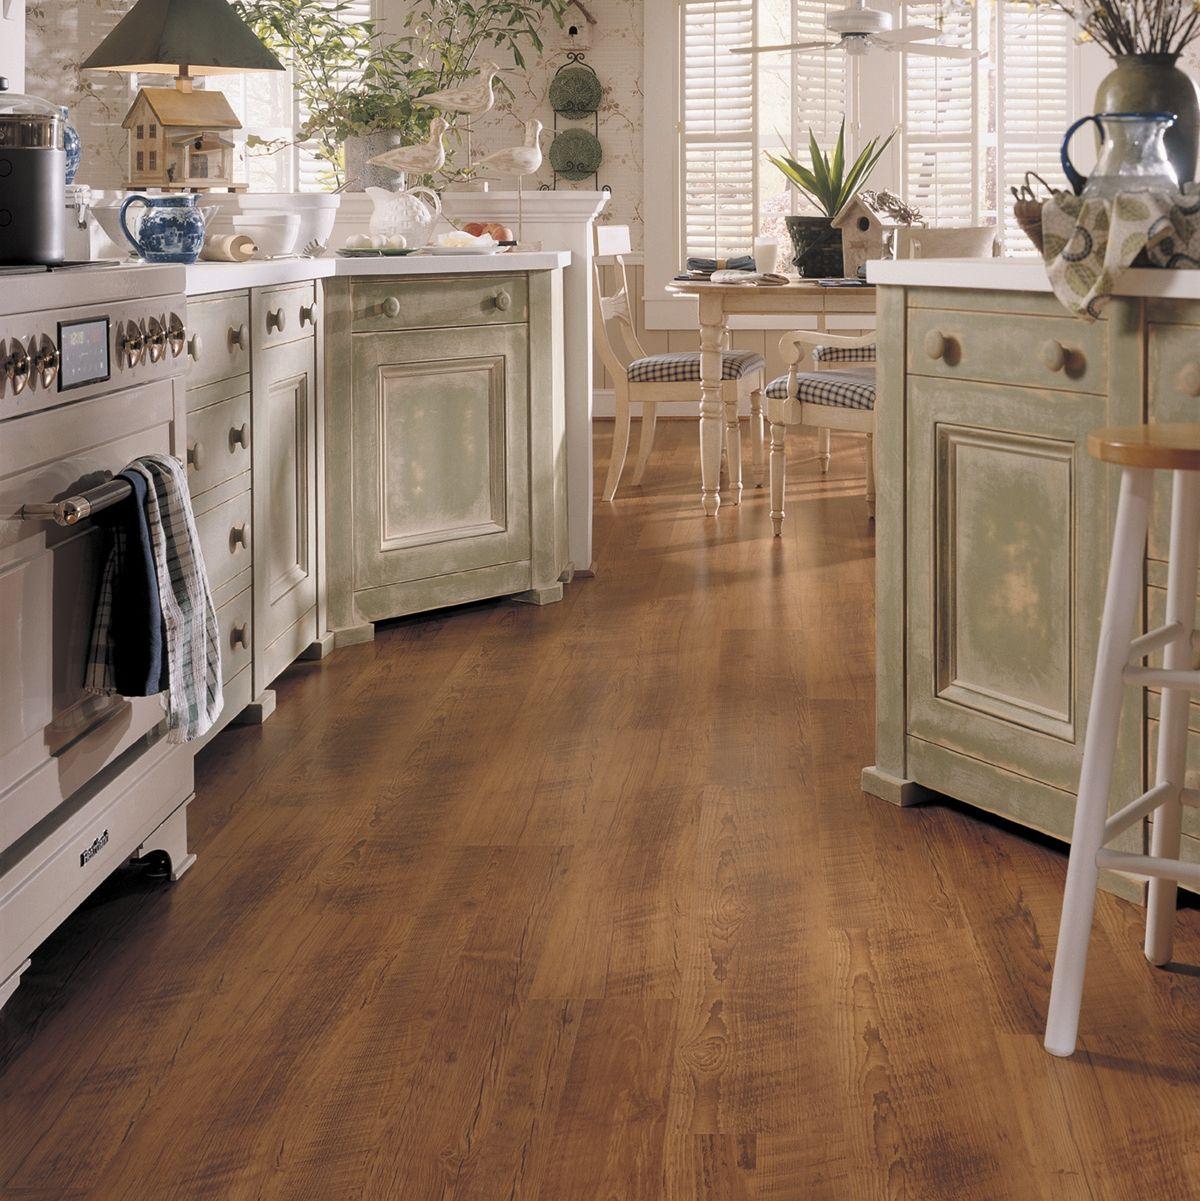 Best Laminate Flooring For Kitchen: Pin On Laminate Flooring